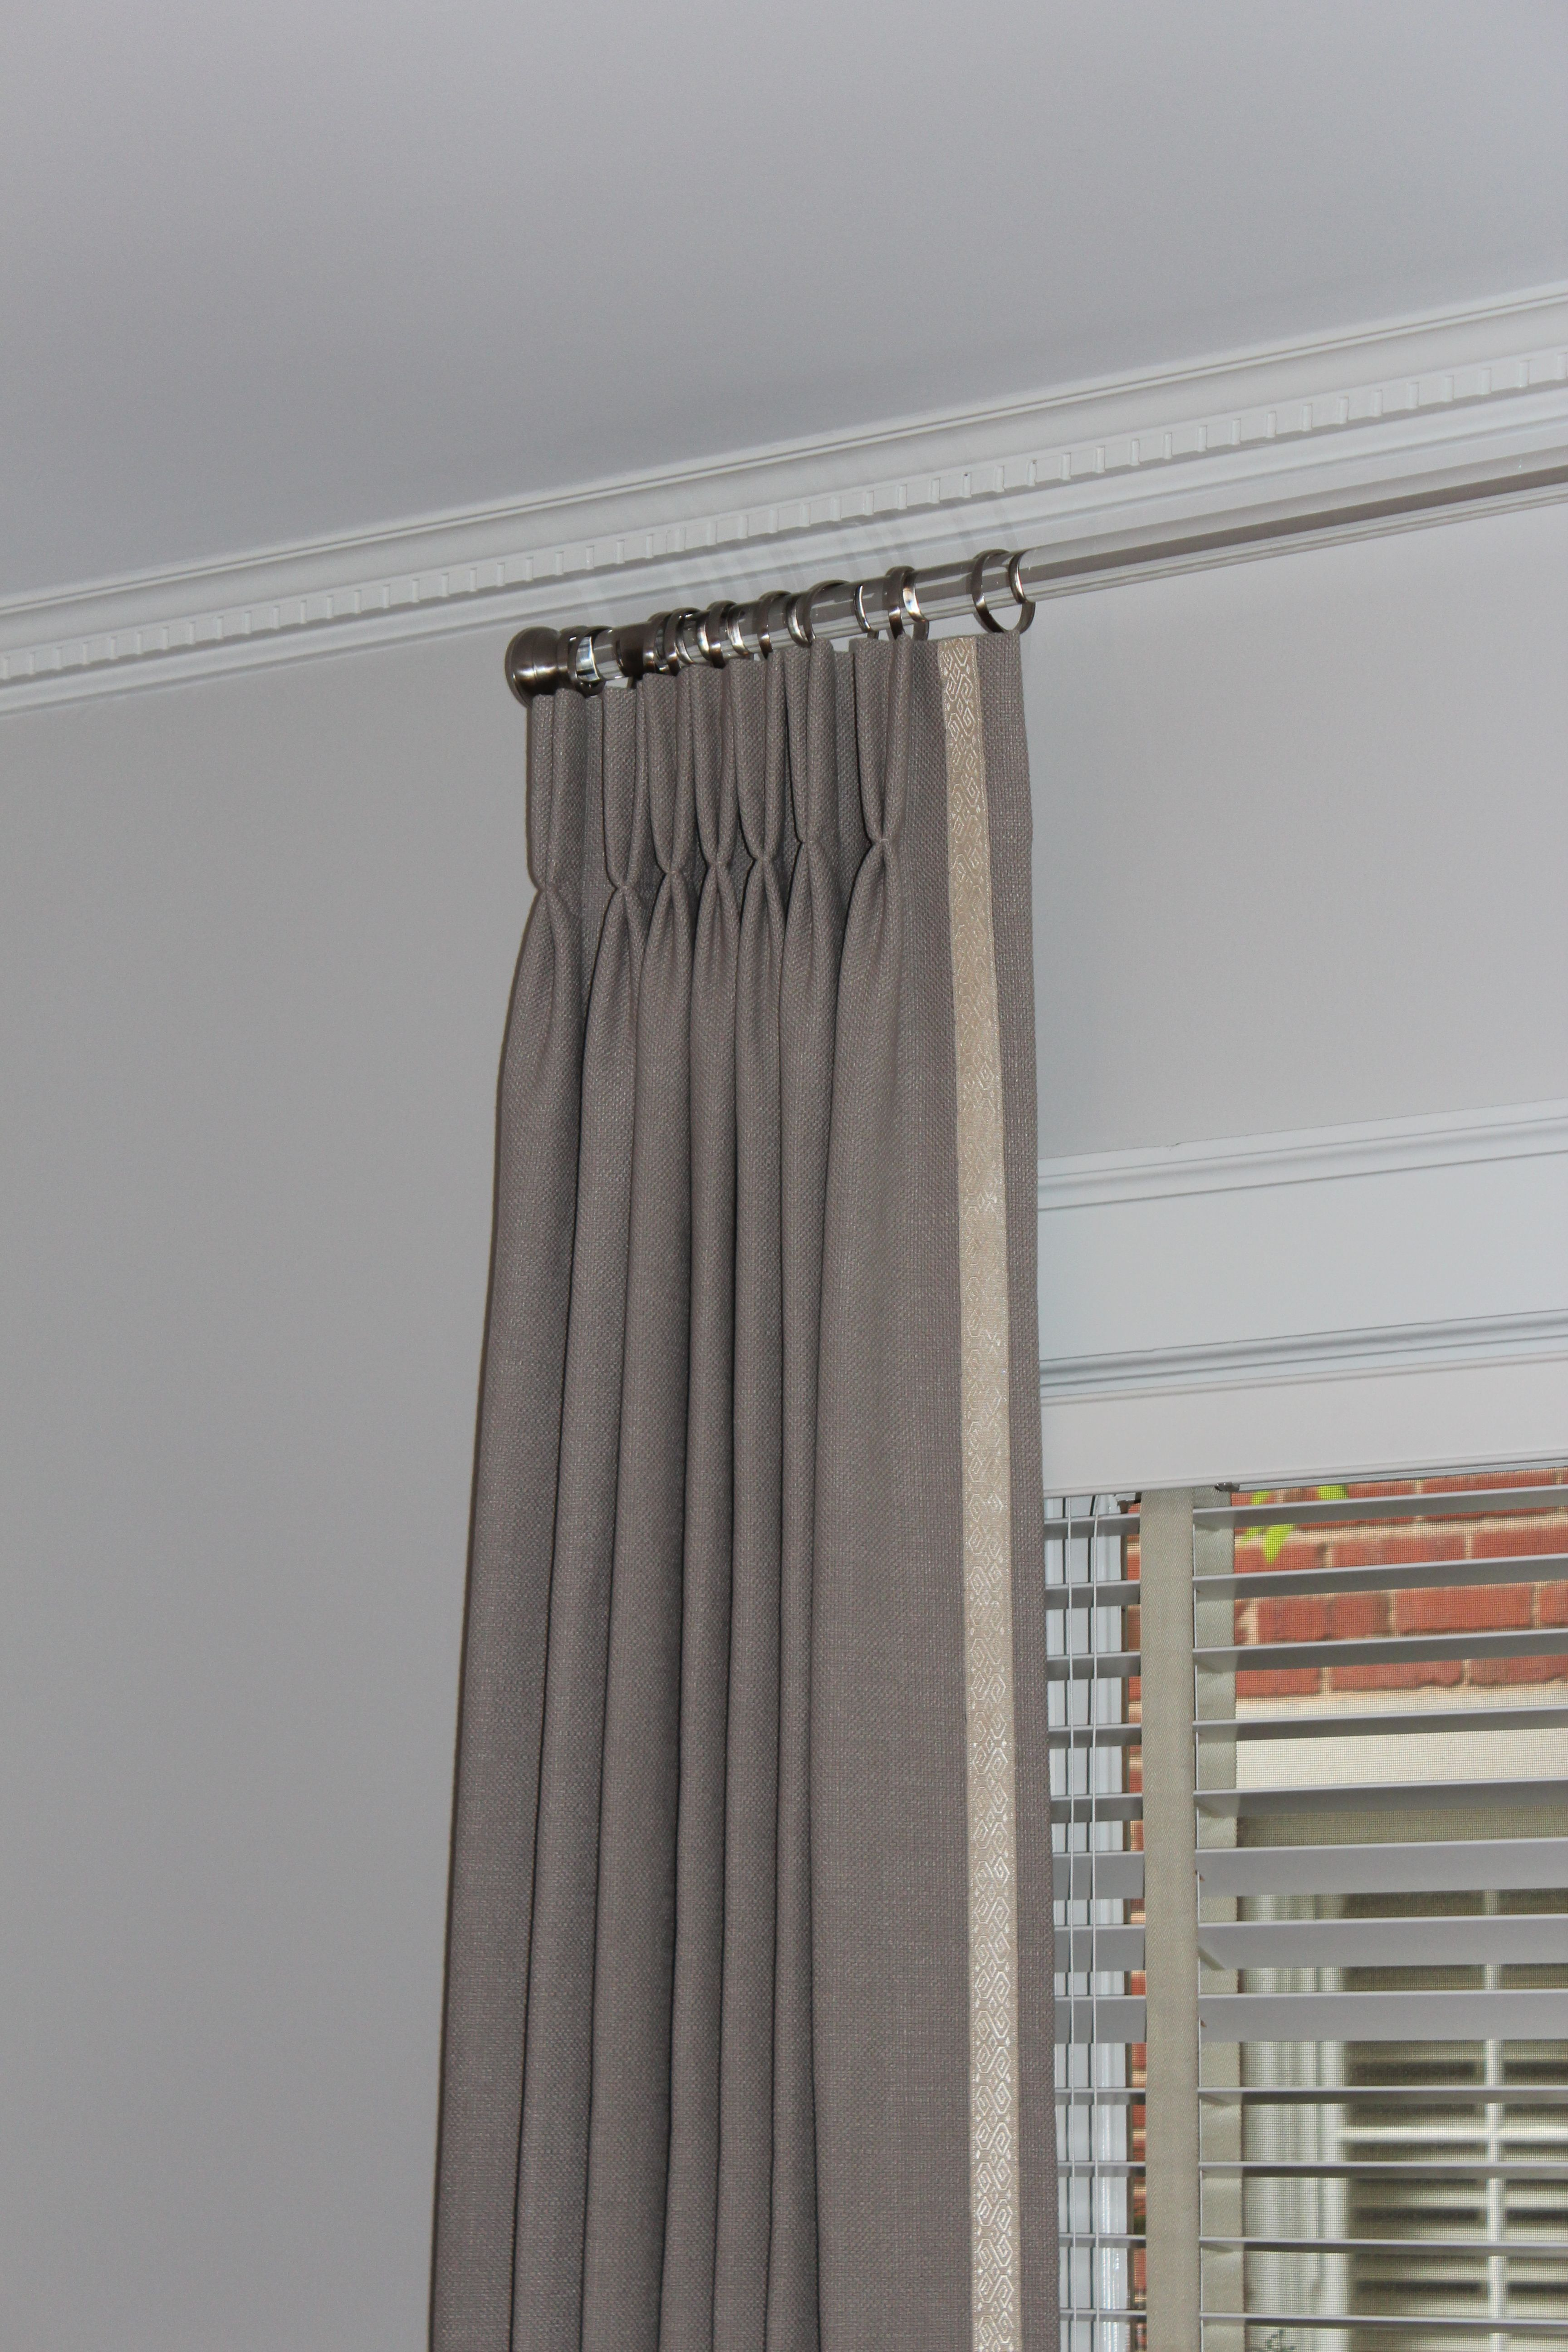 Pinch pleat panels with leading edge trim draperypanels curtains panels pinterest - Estor para ducha ...